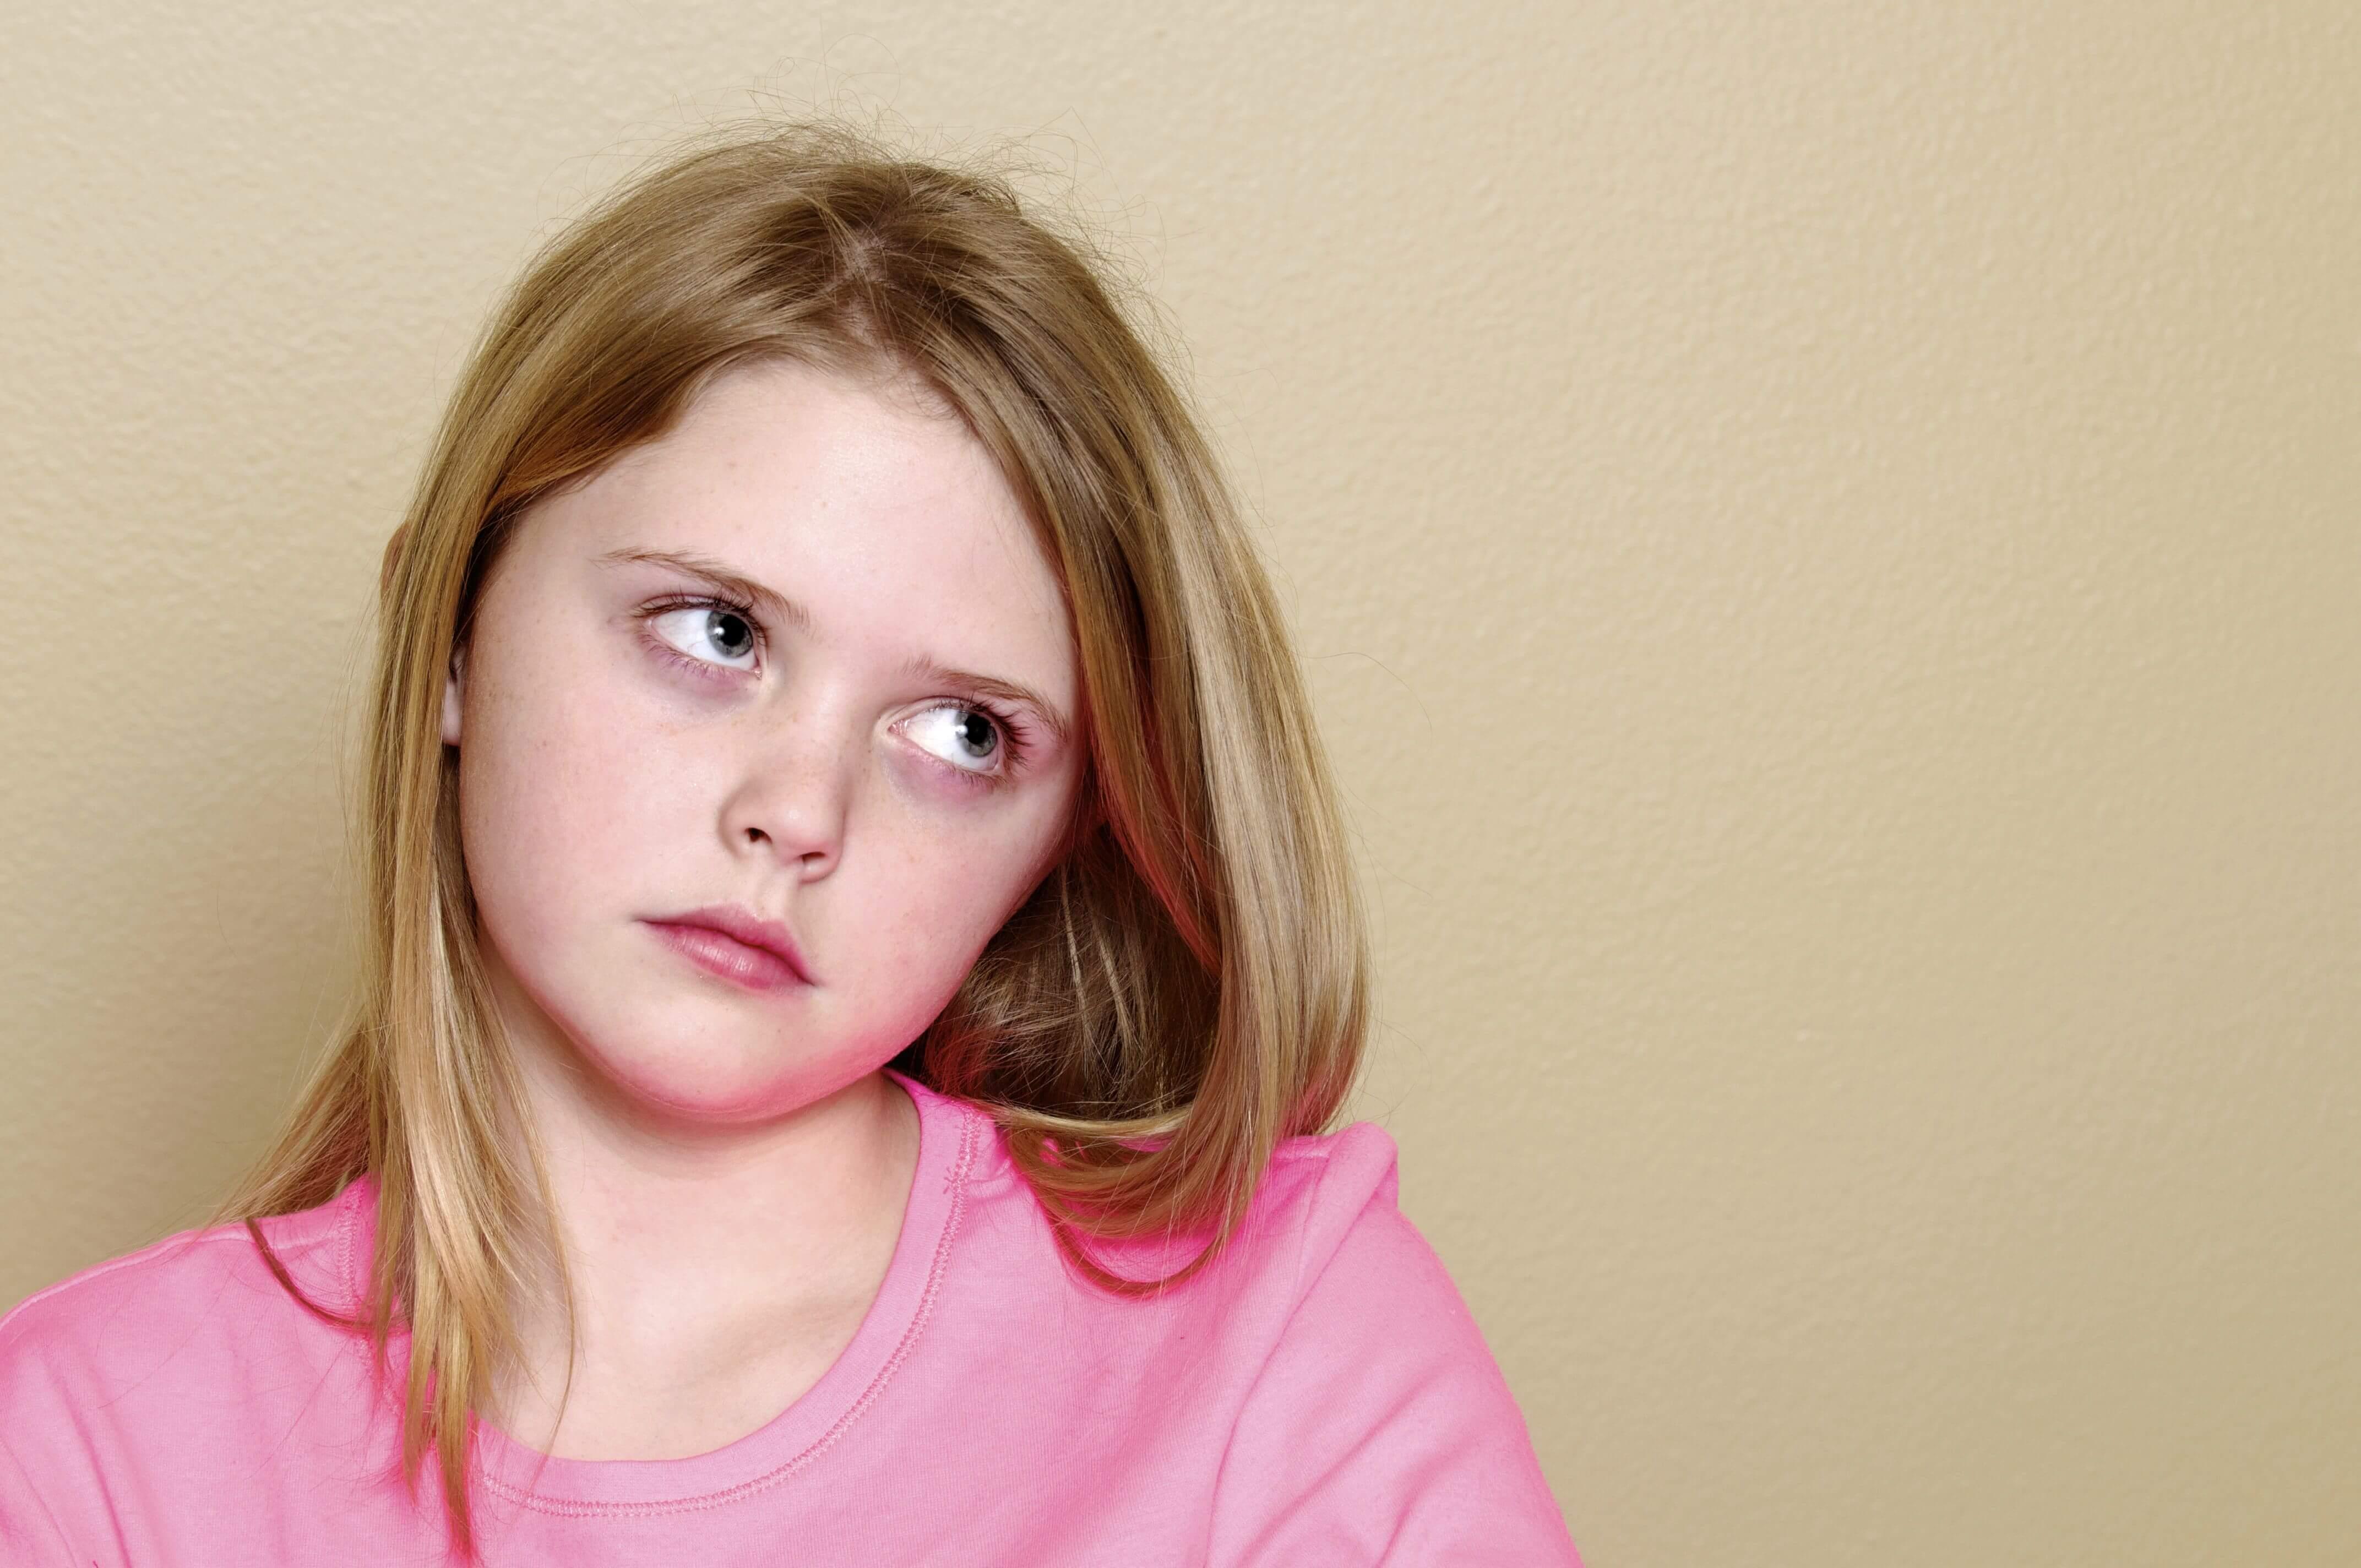 Девочка закатывает глаза